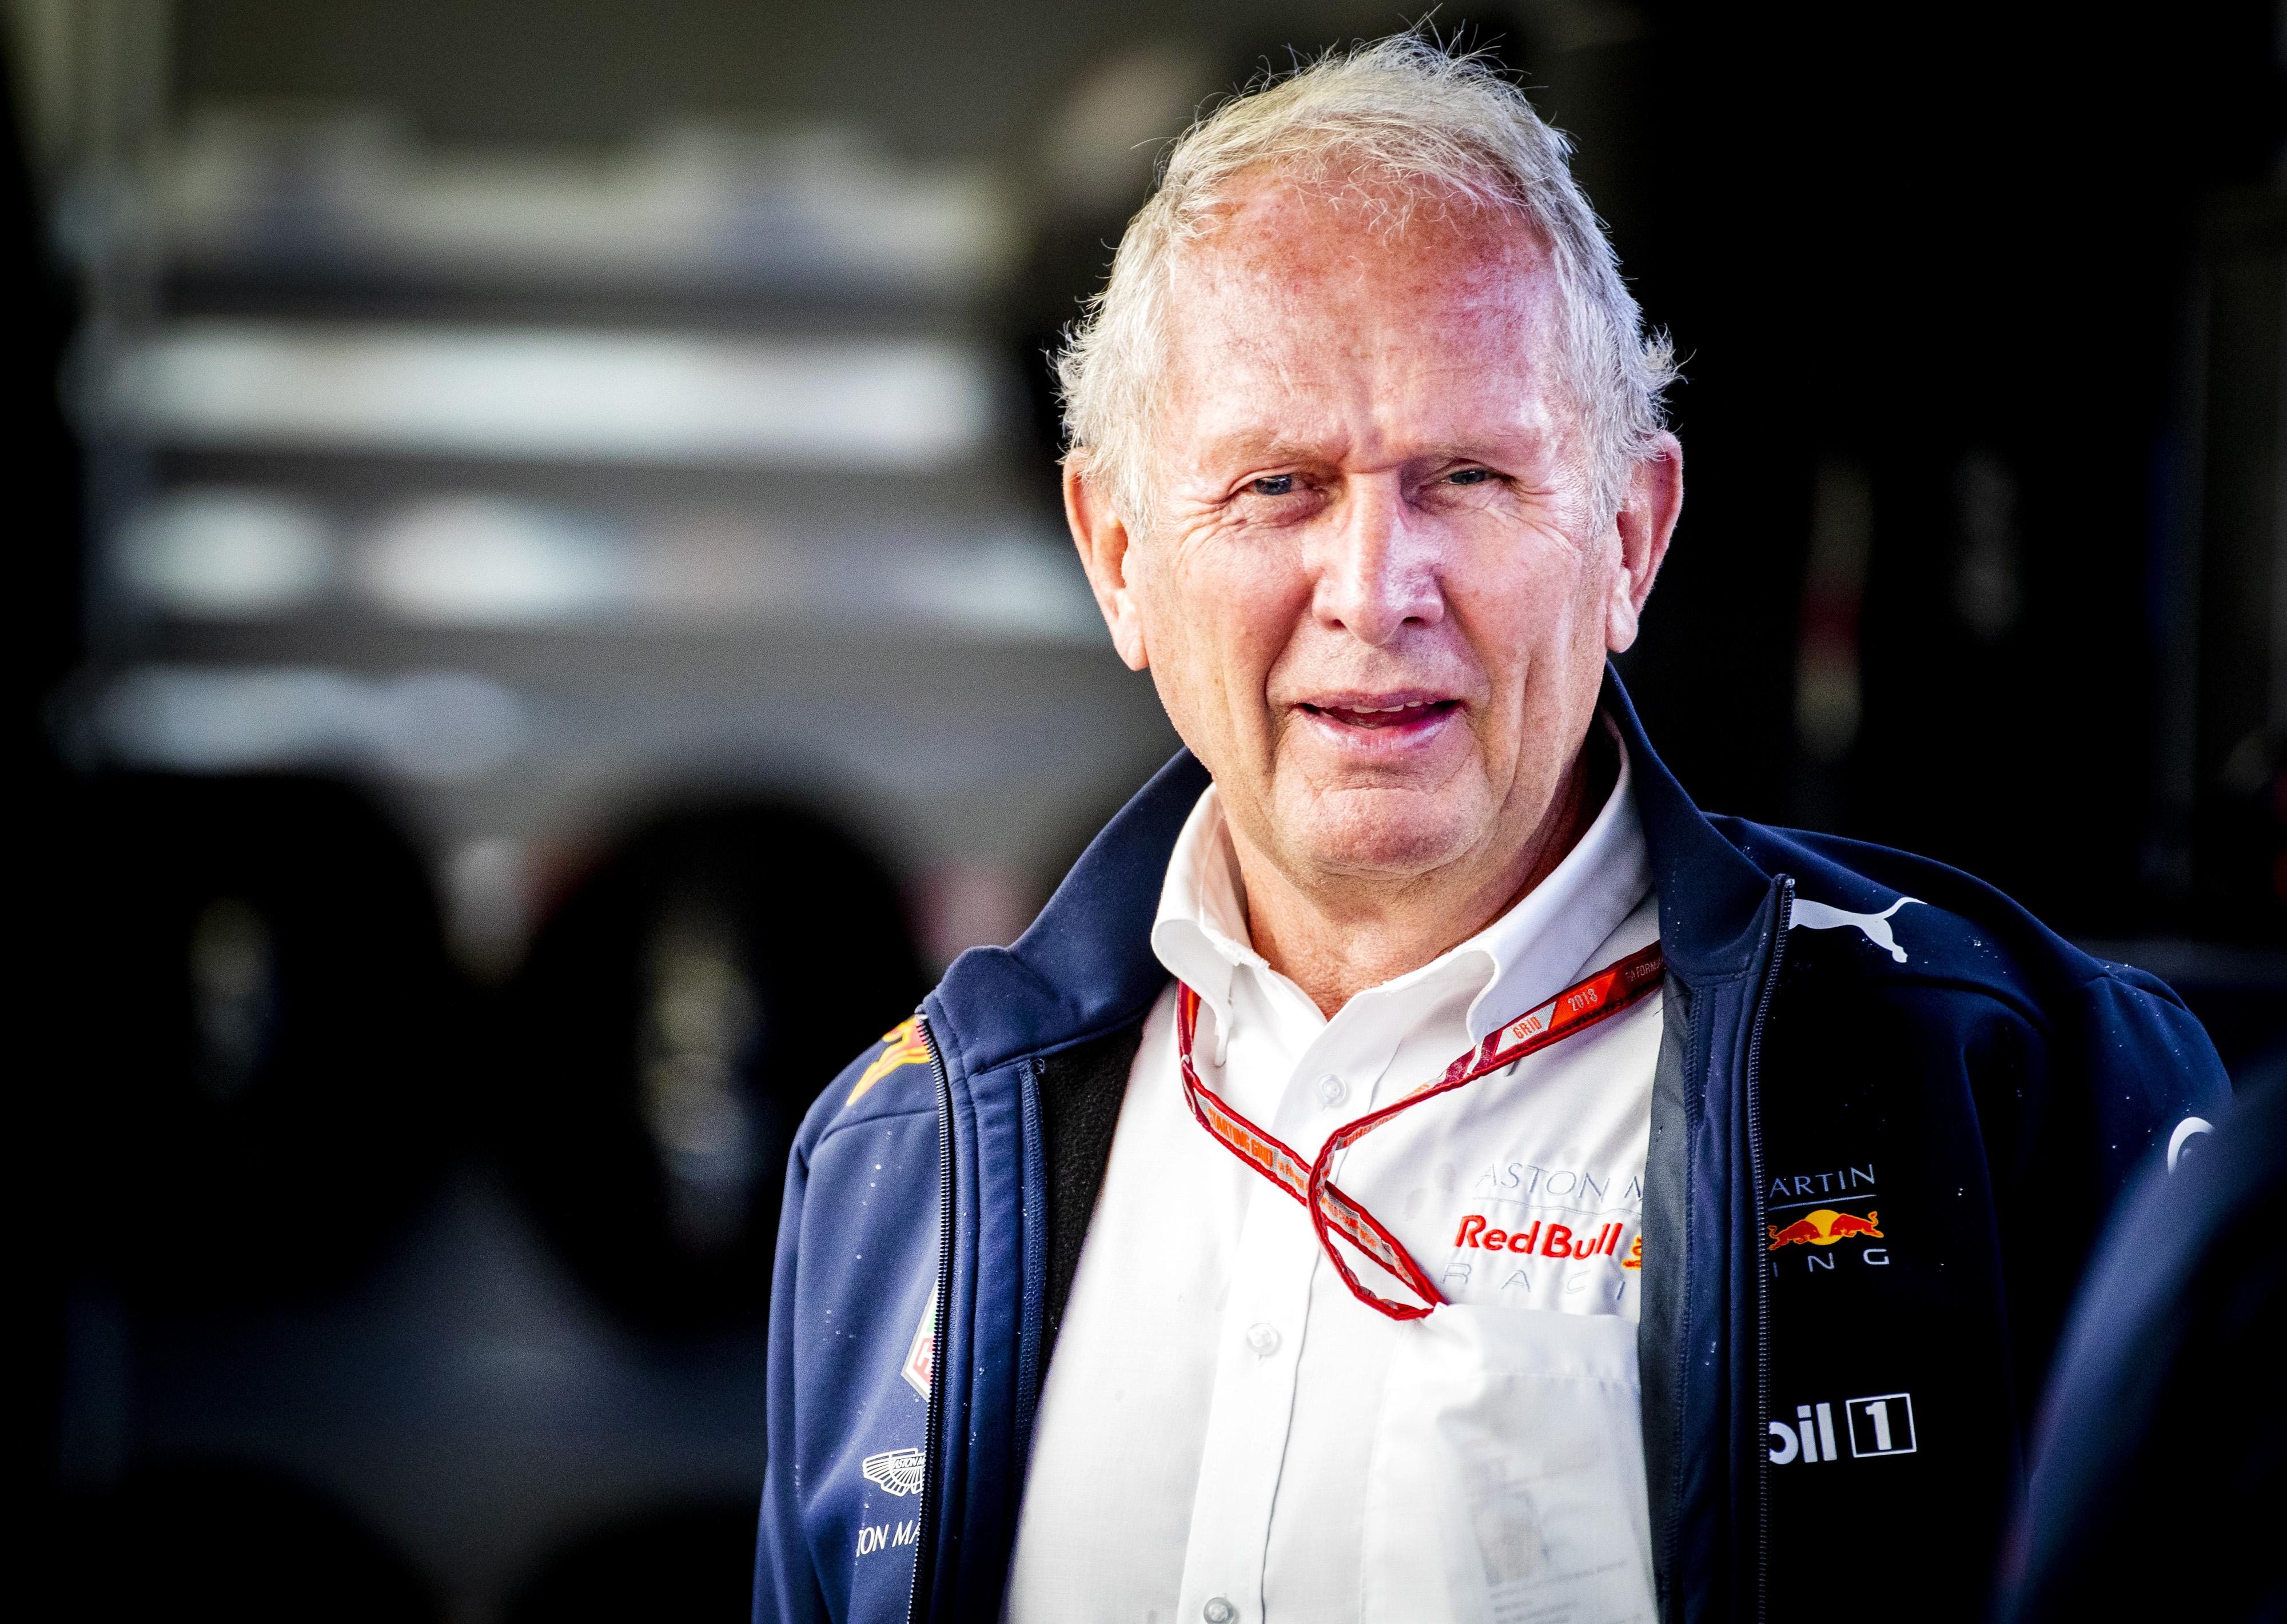 Max Verstappen loonsverhoging Red Bull Racing Helmut Marko